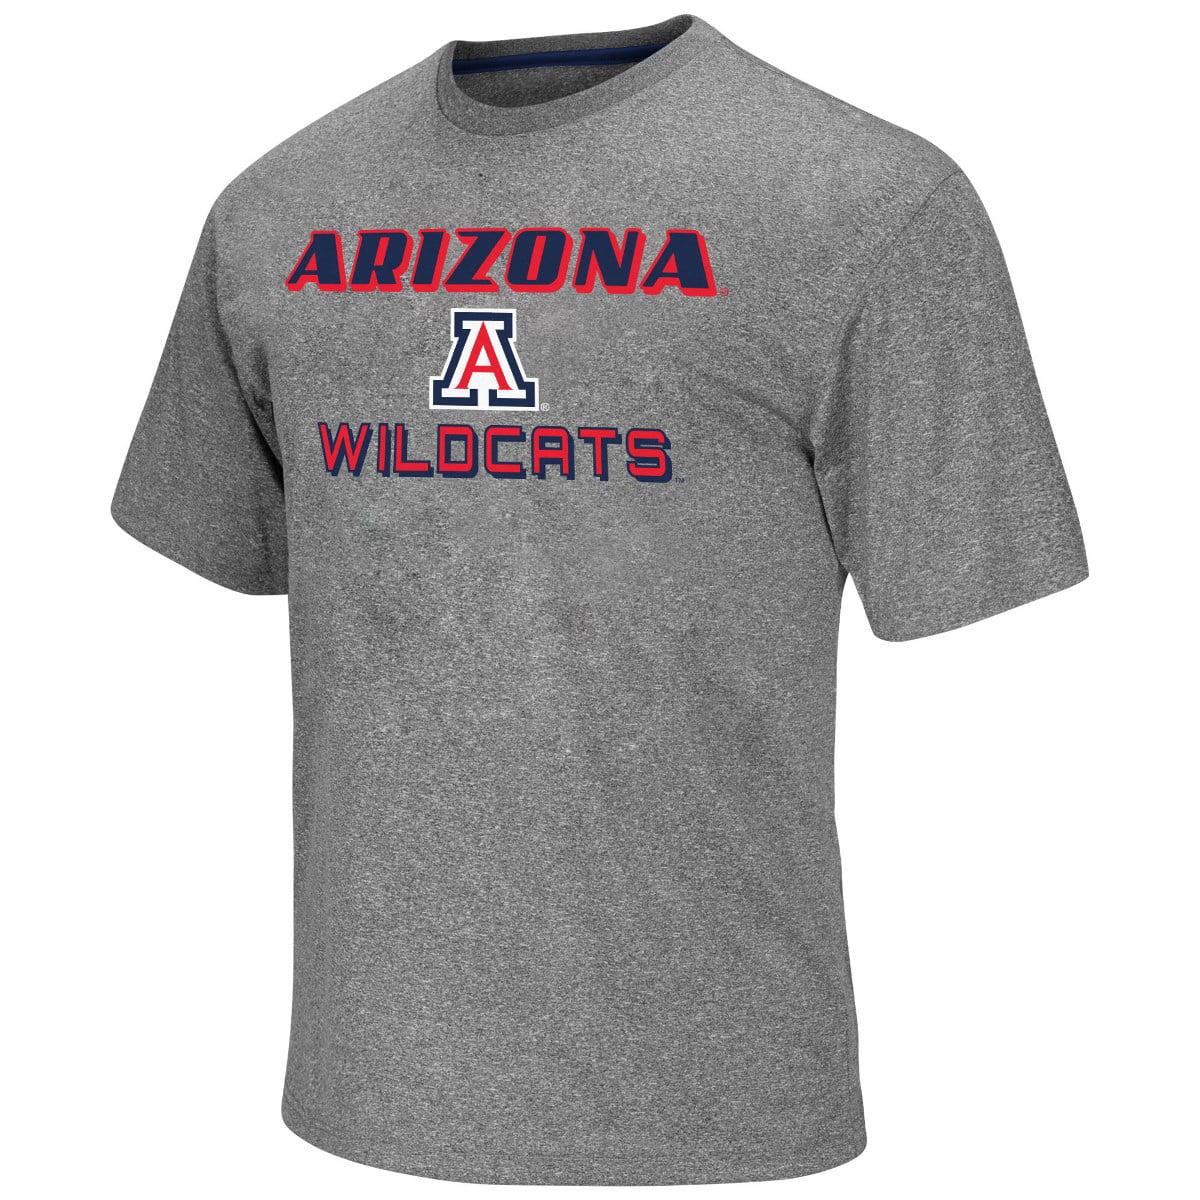 "Arizona Wildcats NCAA ""Arena"" Men's Performance Shirt - Charcoal"